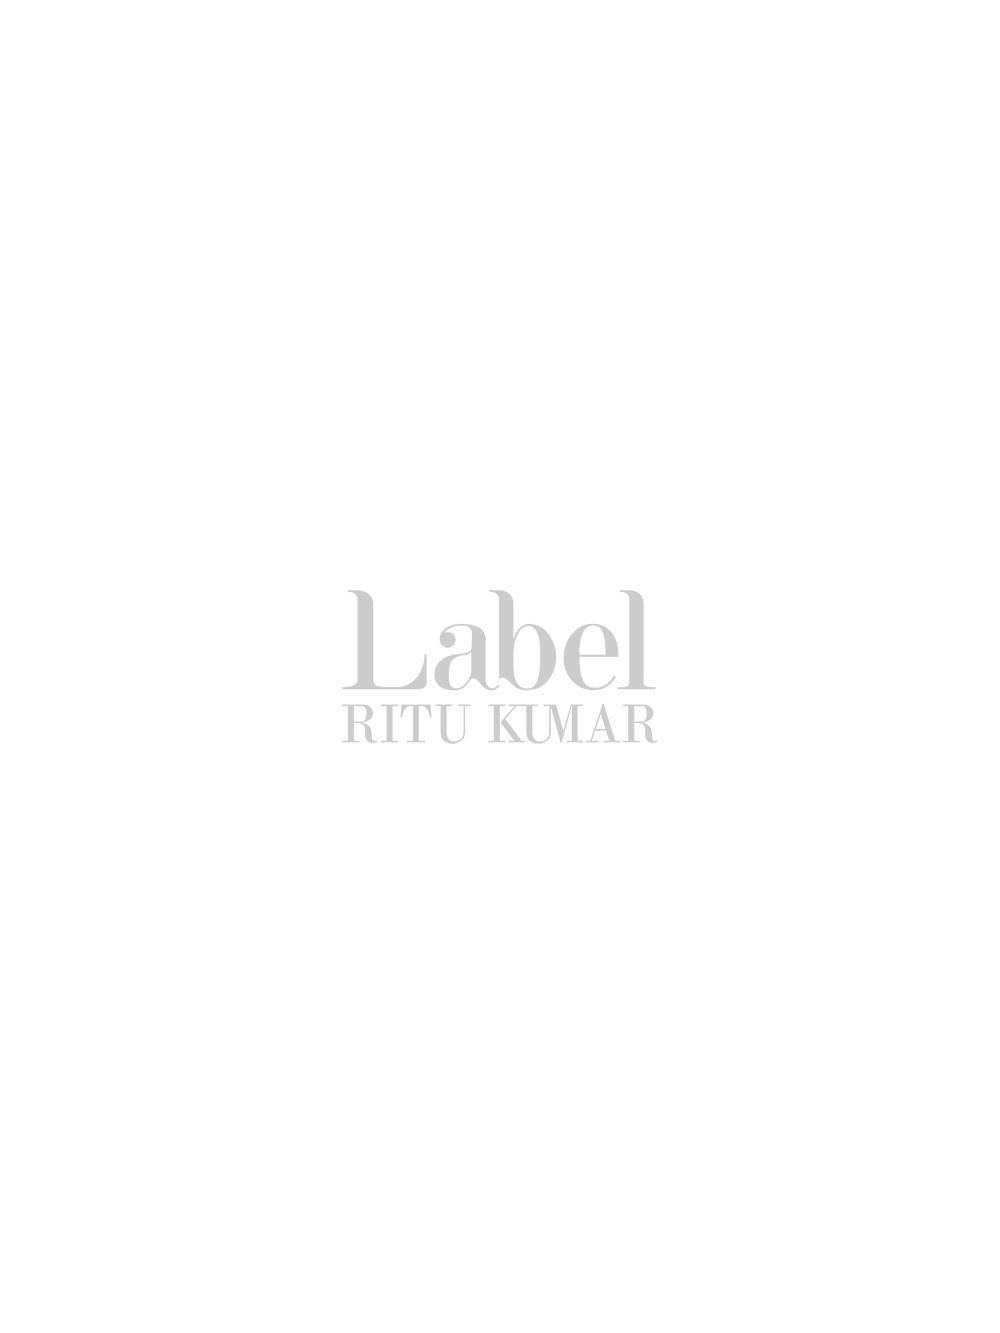 Grey Embellished Long Dress by label ritu kumar